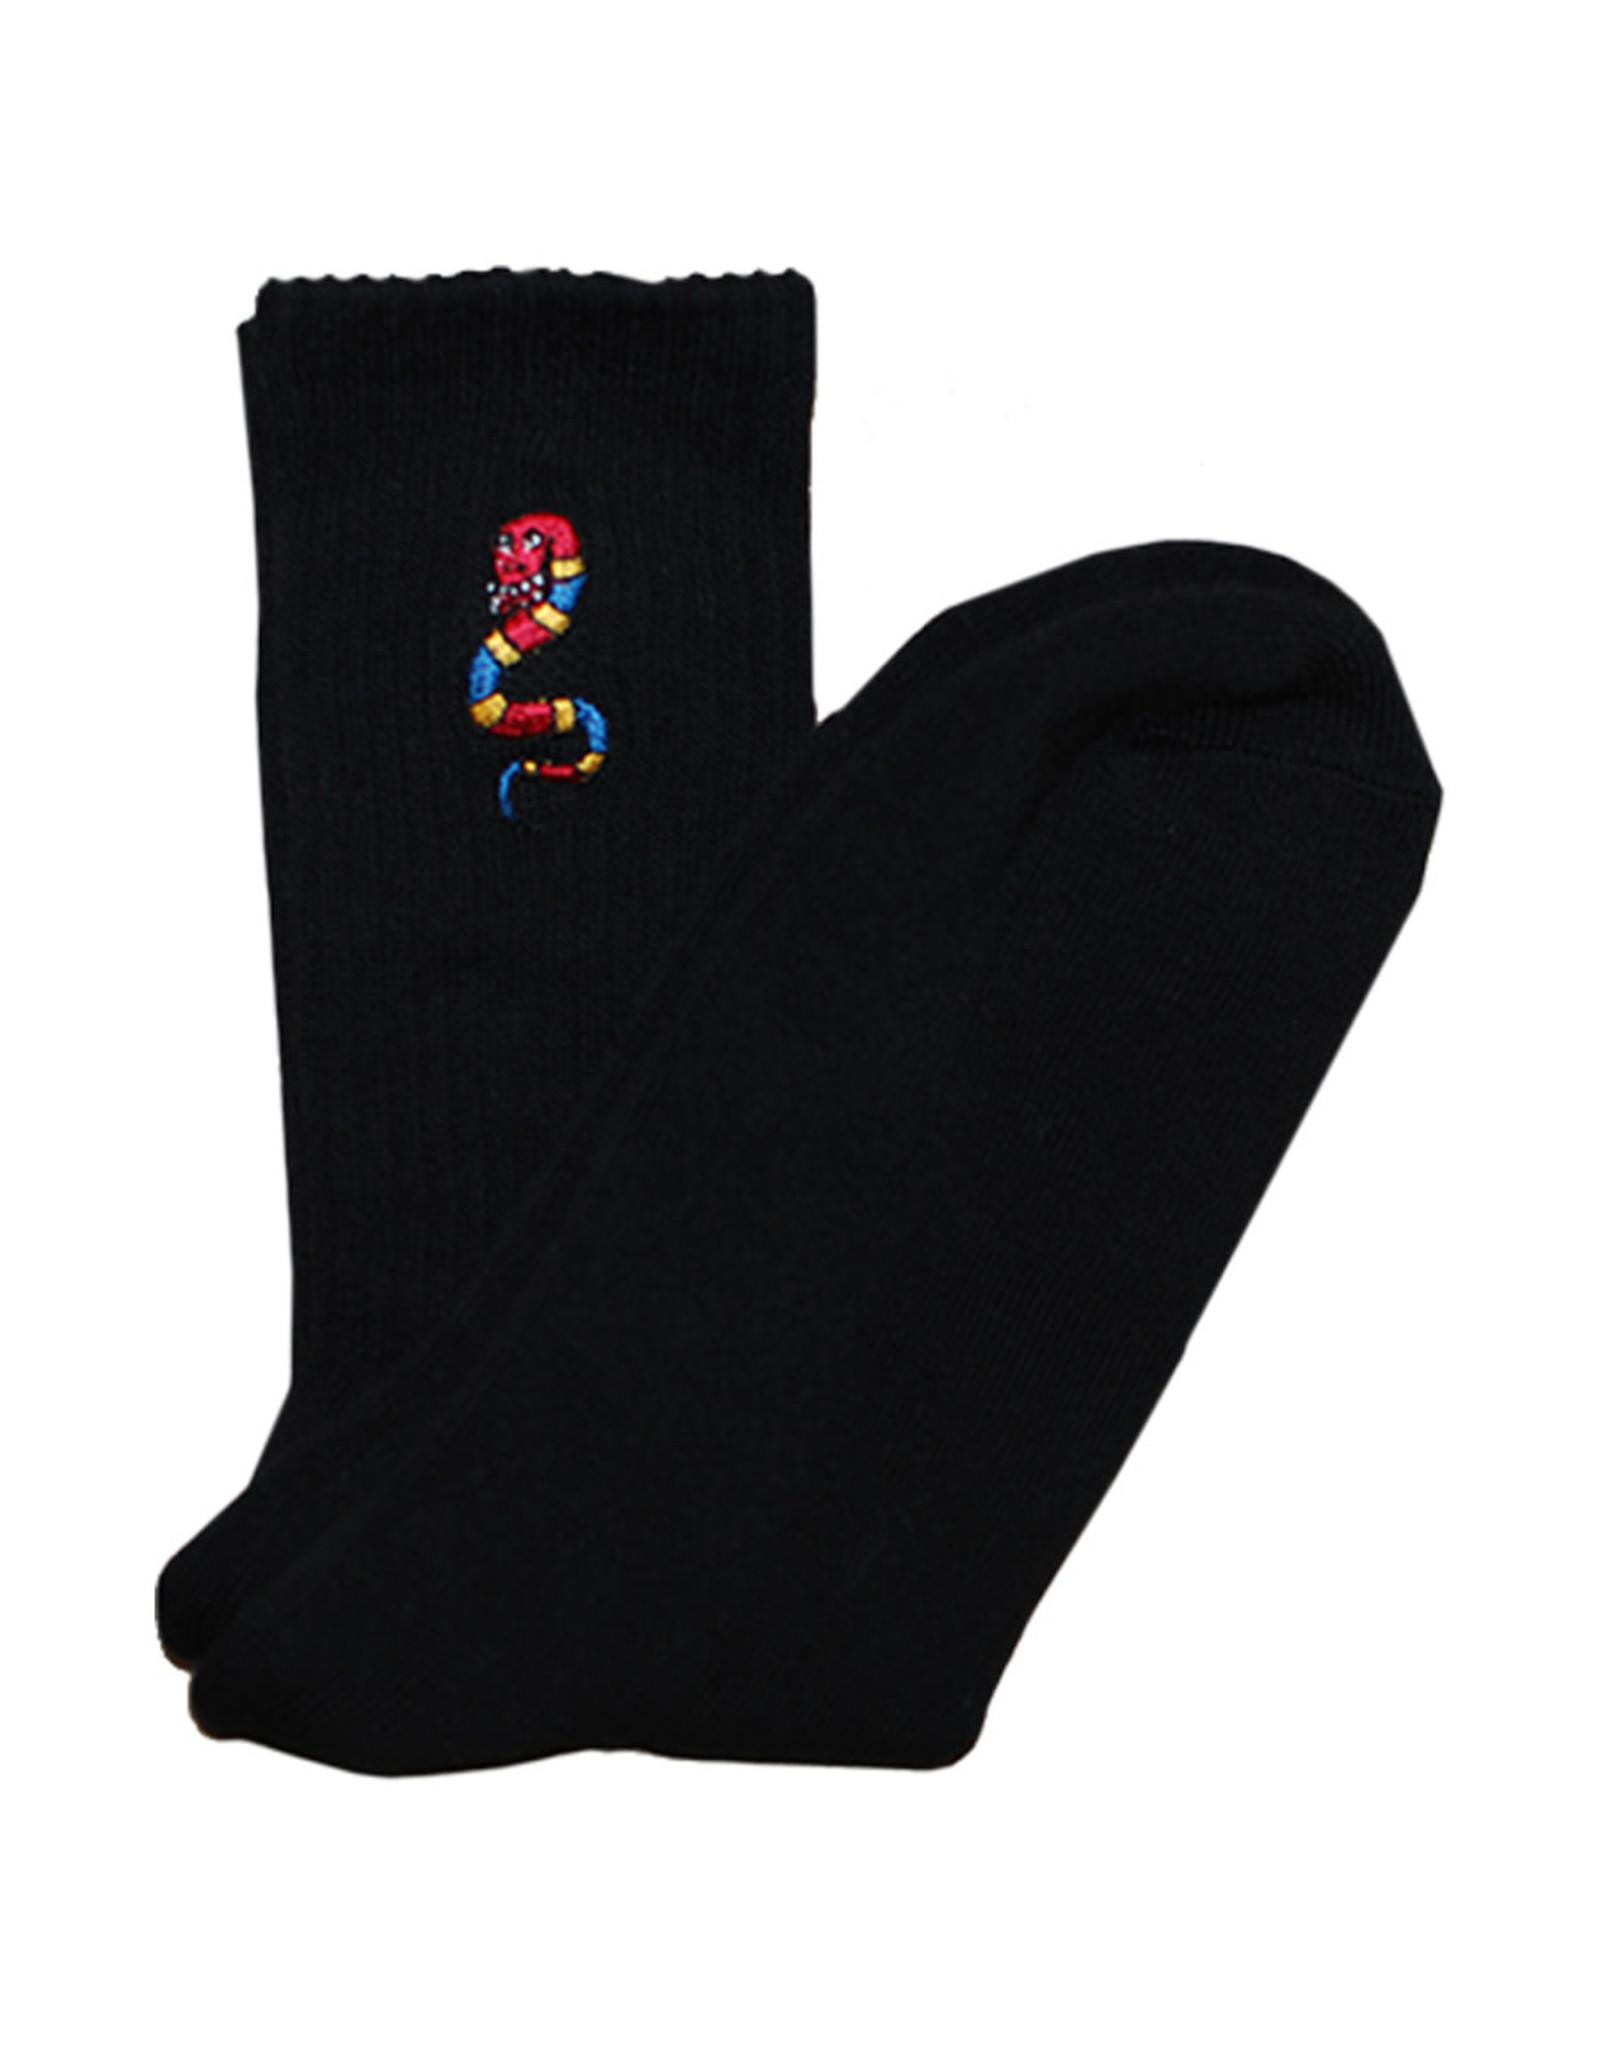 Foundation Foundation Socks Hisss Crew (Black)